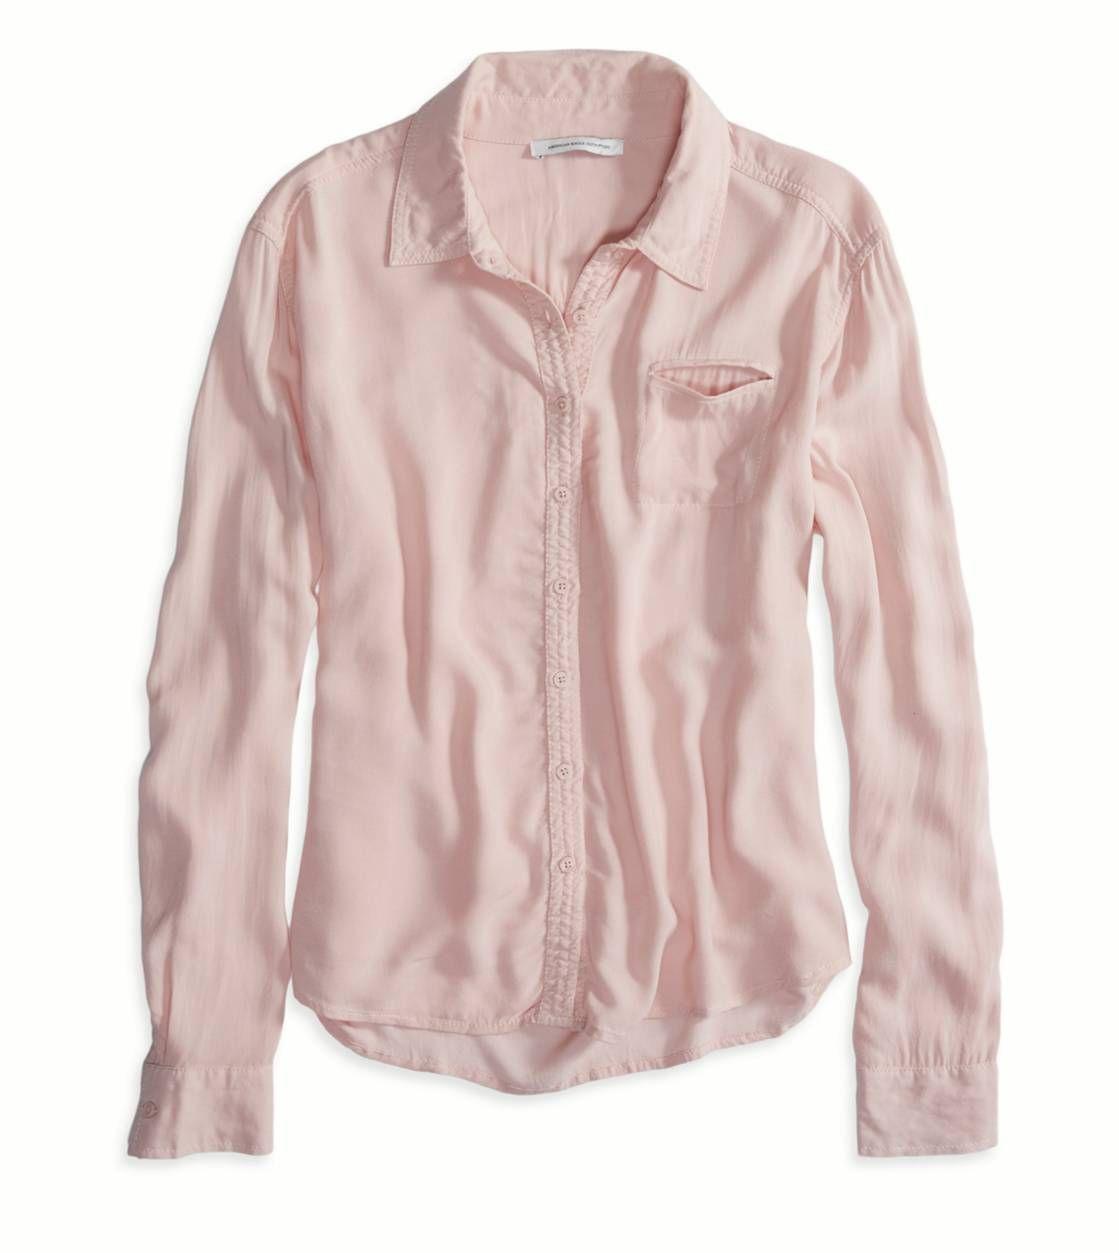 AEO Factory Drapey Button Down Shirt